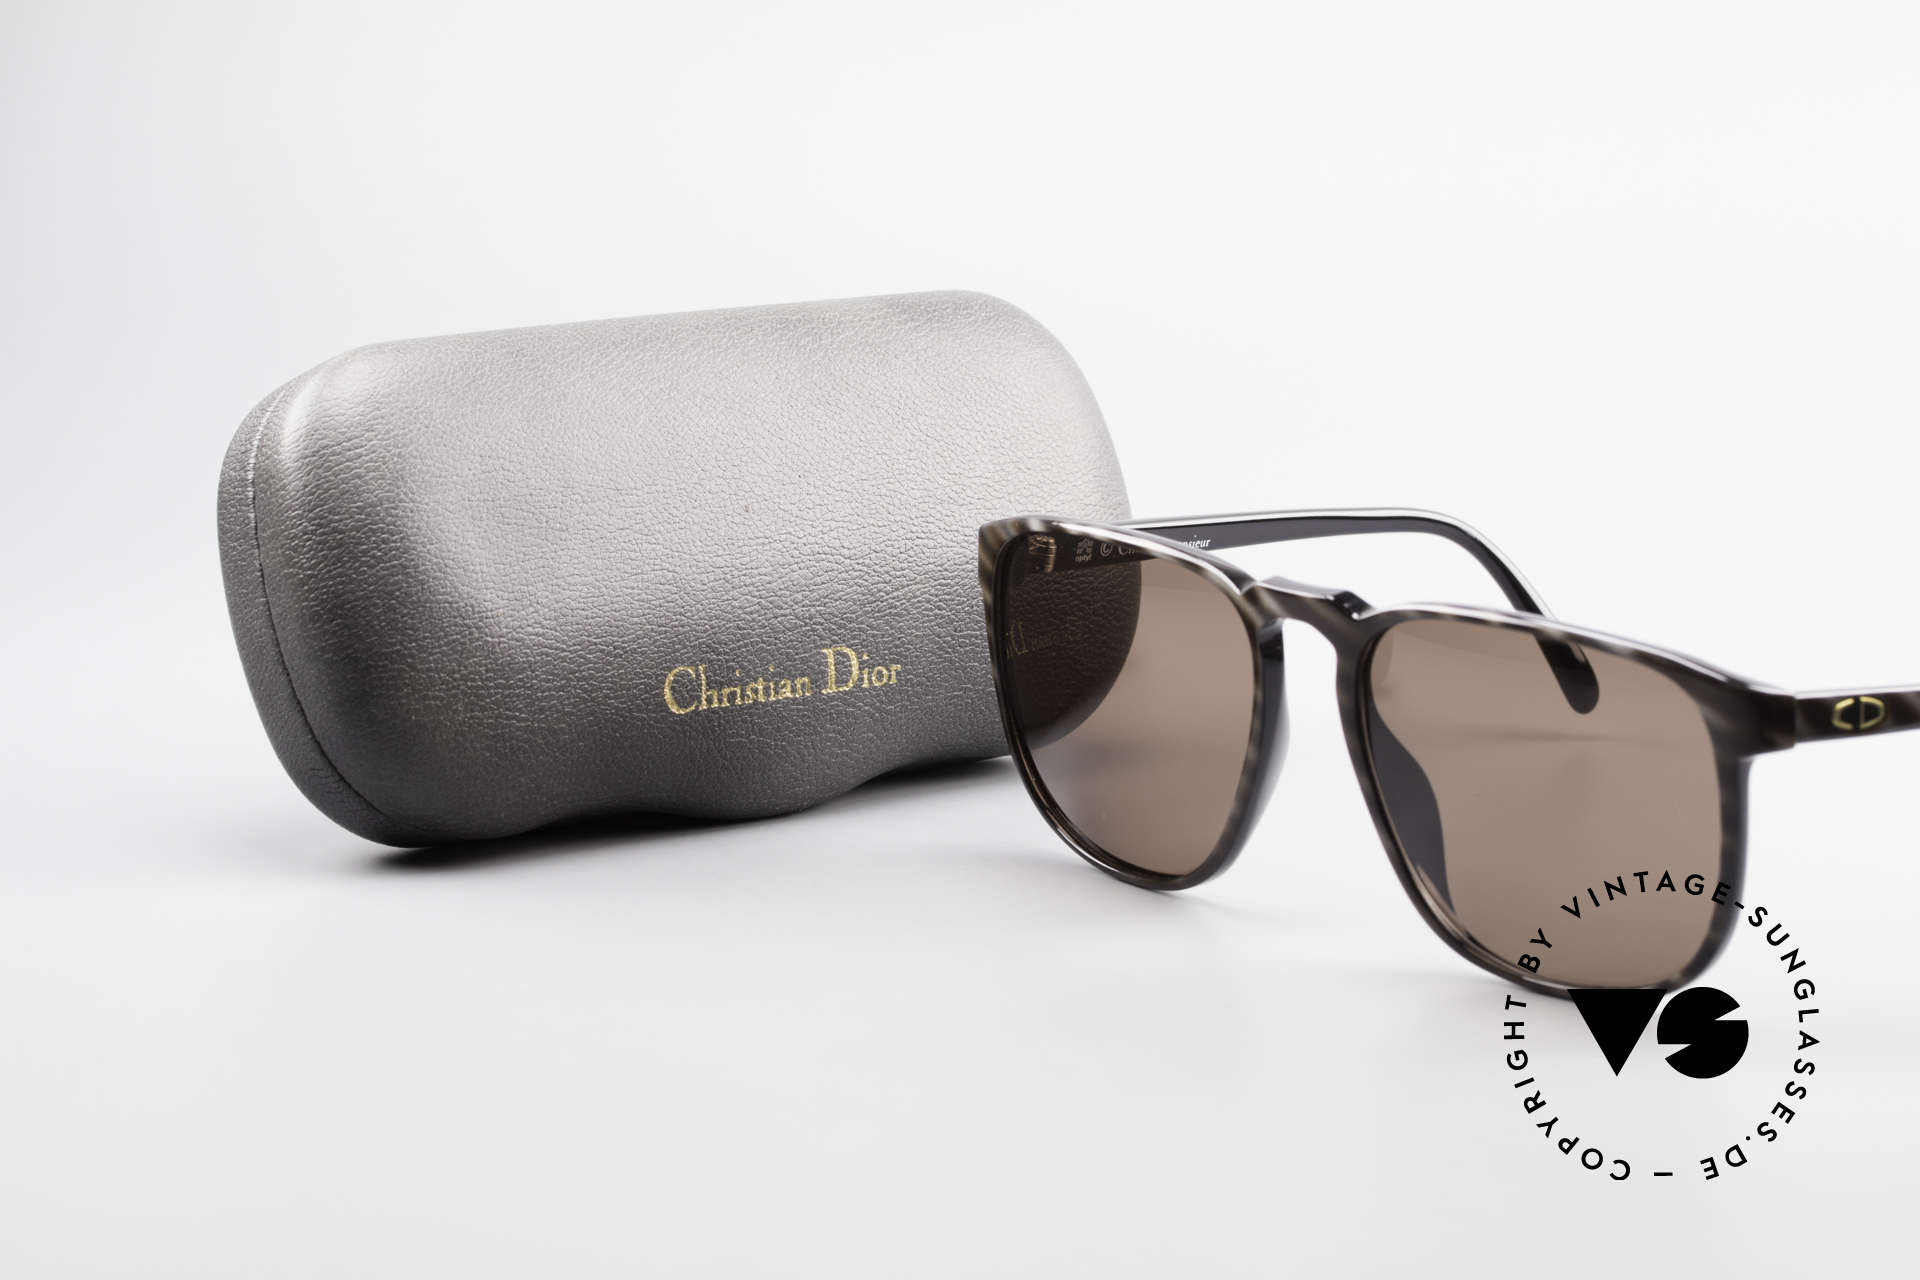 Christian Dior 2226 Monsieur 80's Optyl Shades, Size: medium, Made for Men